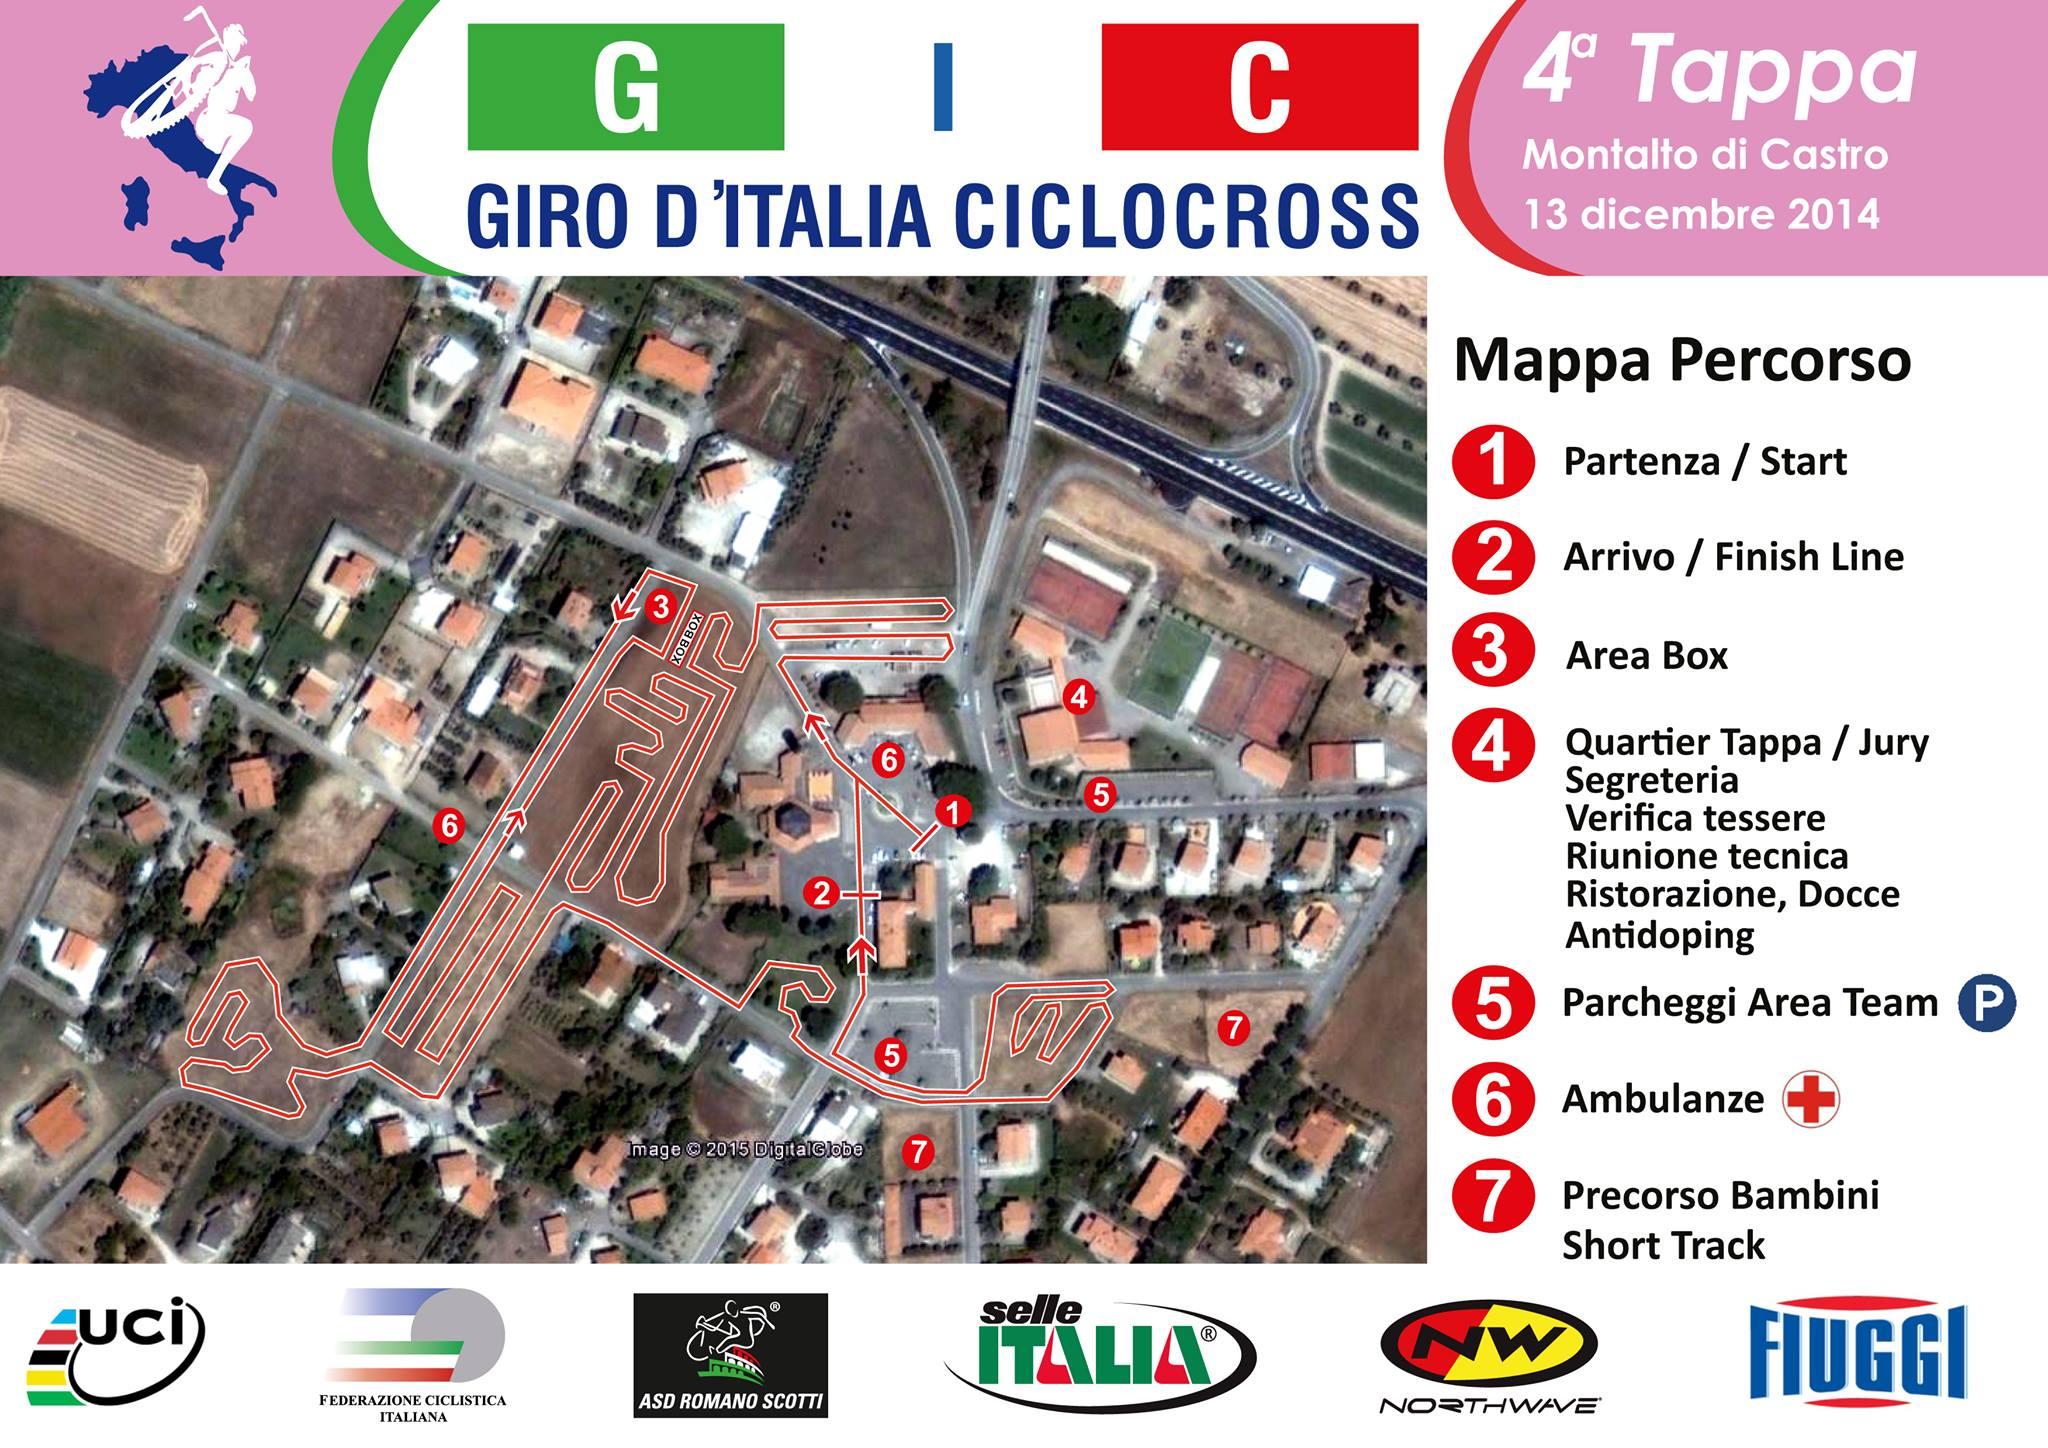 mappa_giro_d'italia_ciclocross